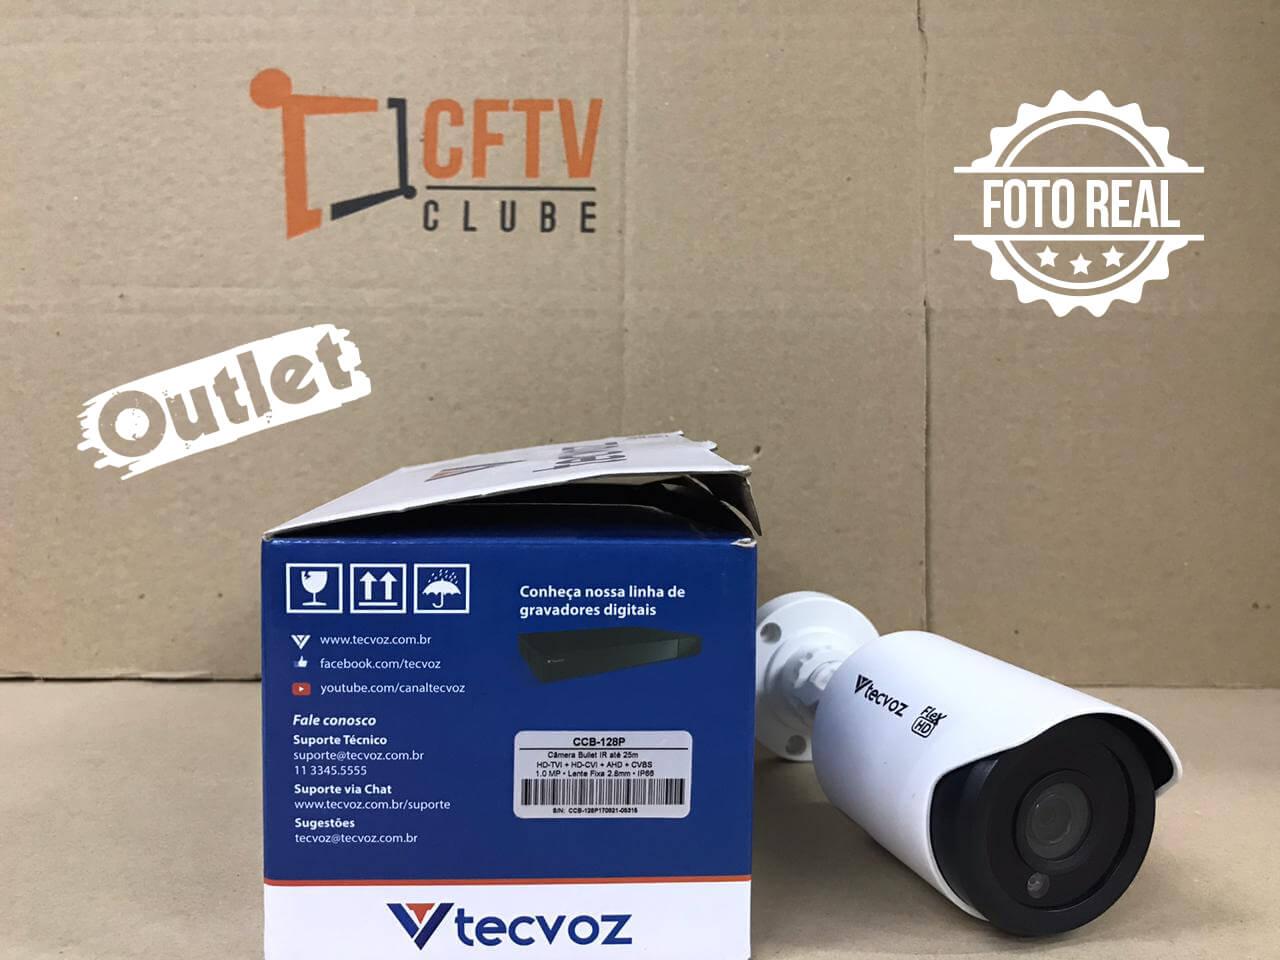 Outlet - Câmera Tecvoz Bullet Flex HD CCB-128P Alta Definição (1.0MP   720p   2.8mm   Plast)  - CFTV Clube   Brasil